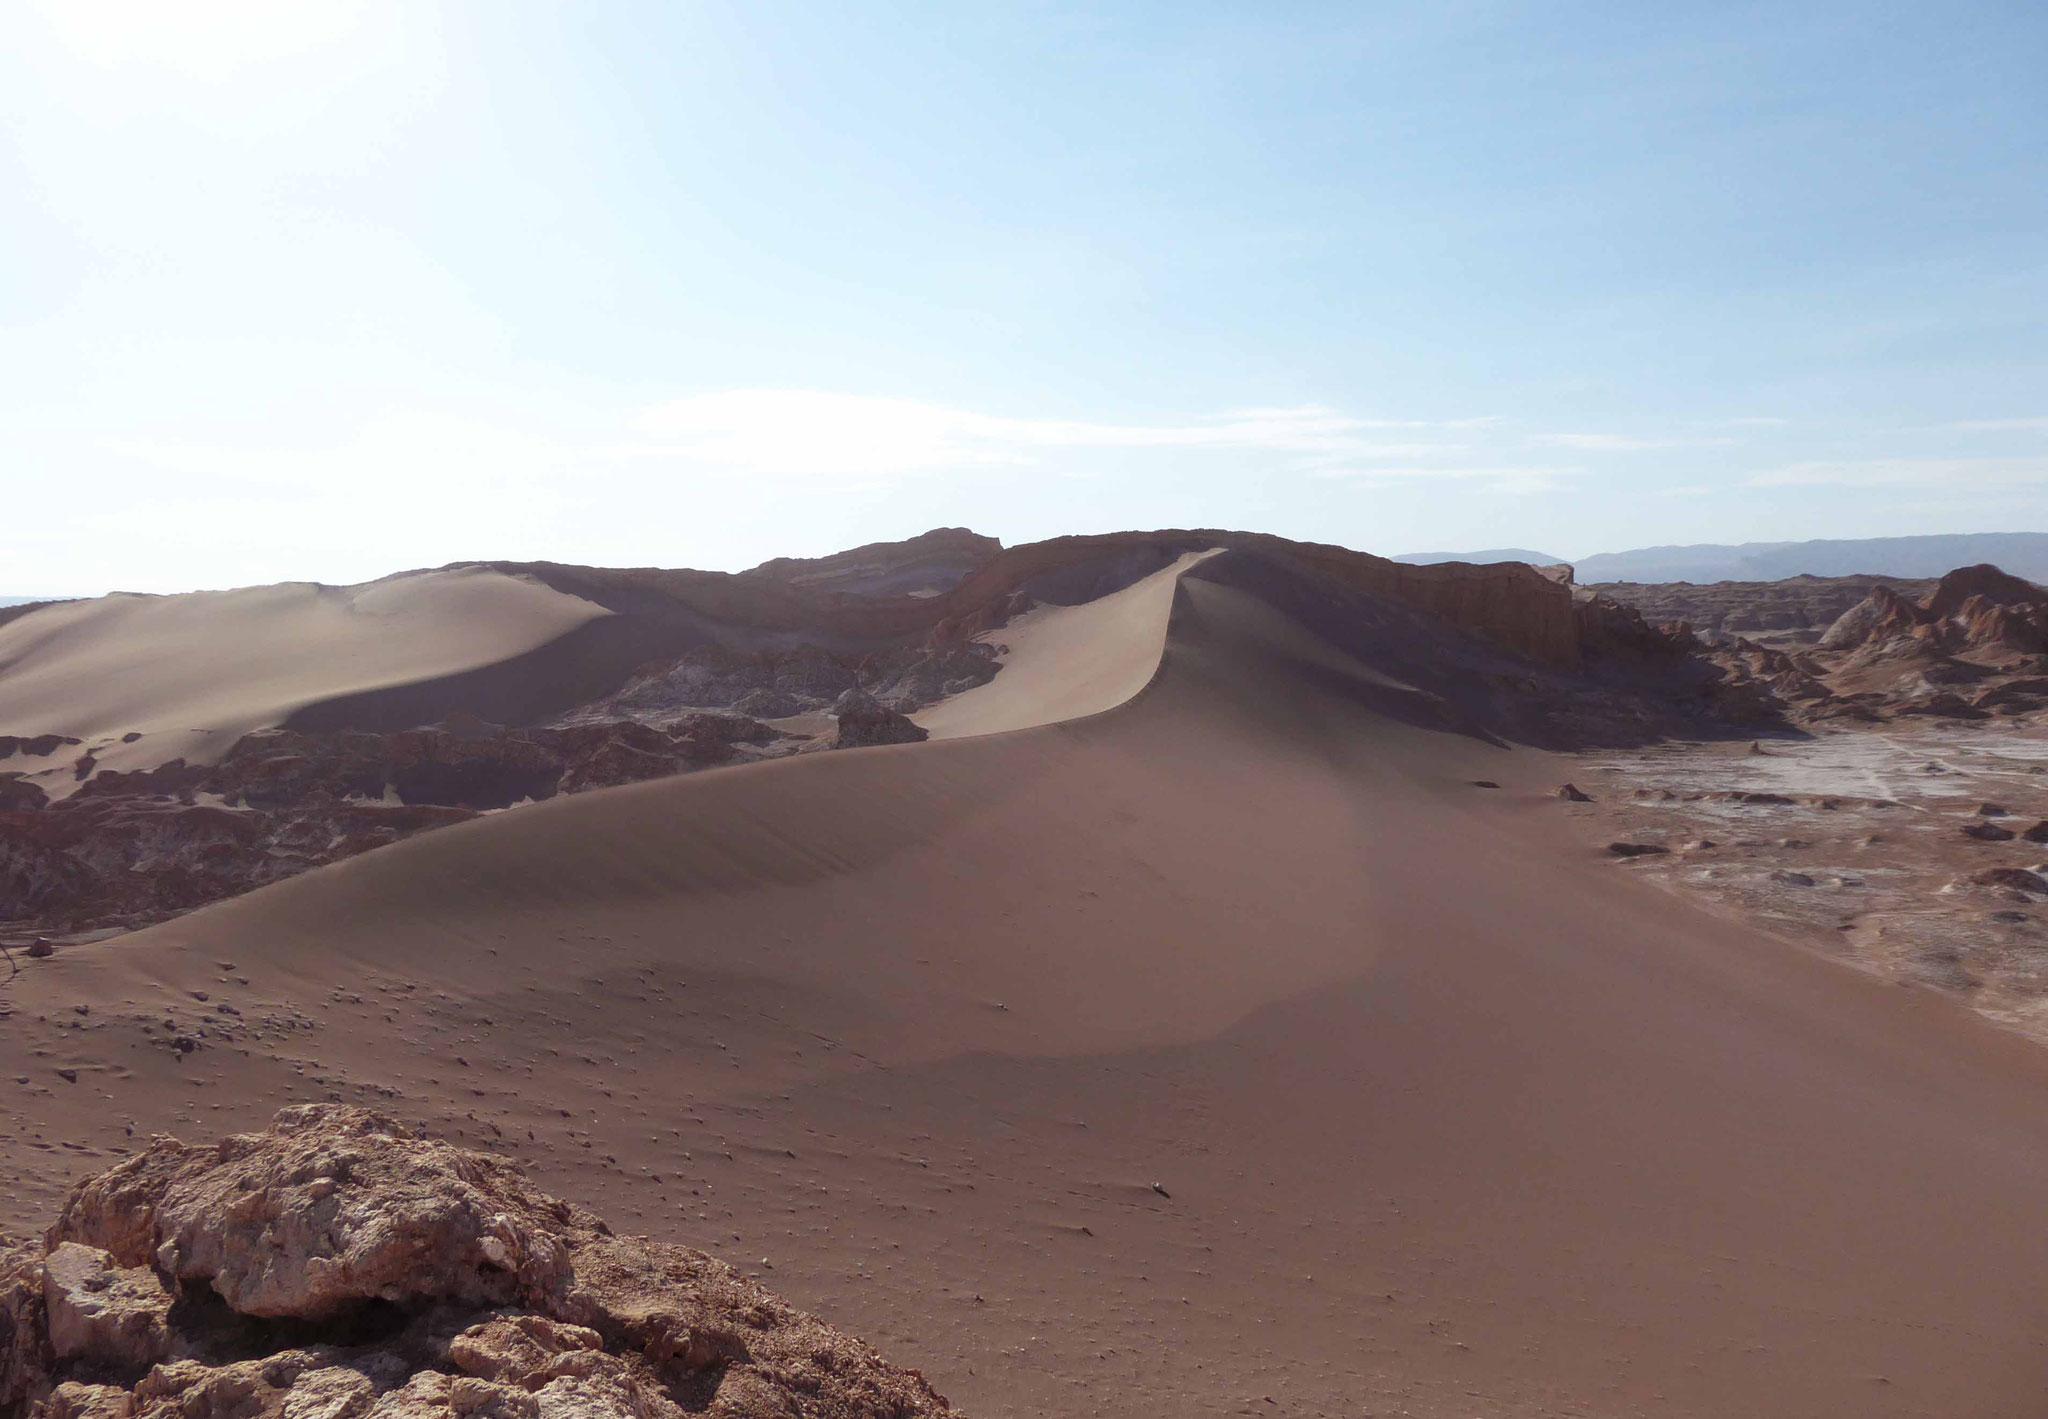 Au point culminant de la duna mayor